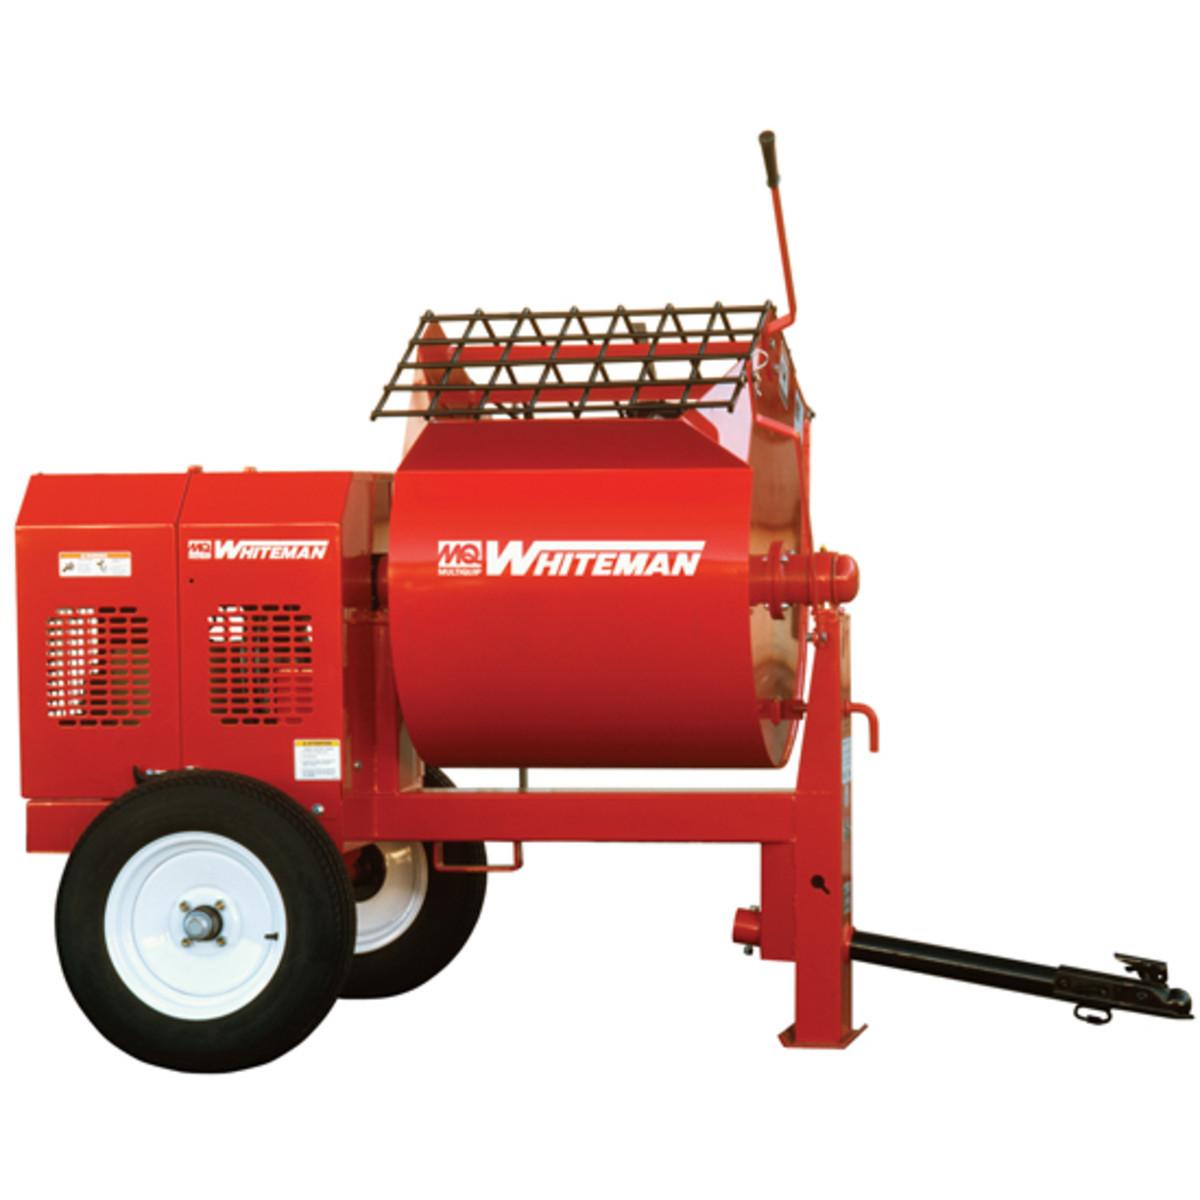 Multiquip Whiteman Wm90sh8 Steel Drum Mortar Mixer Honda